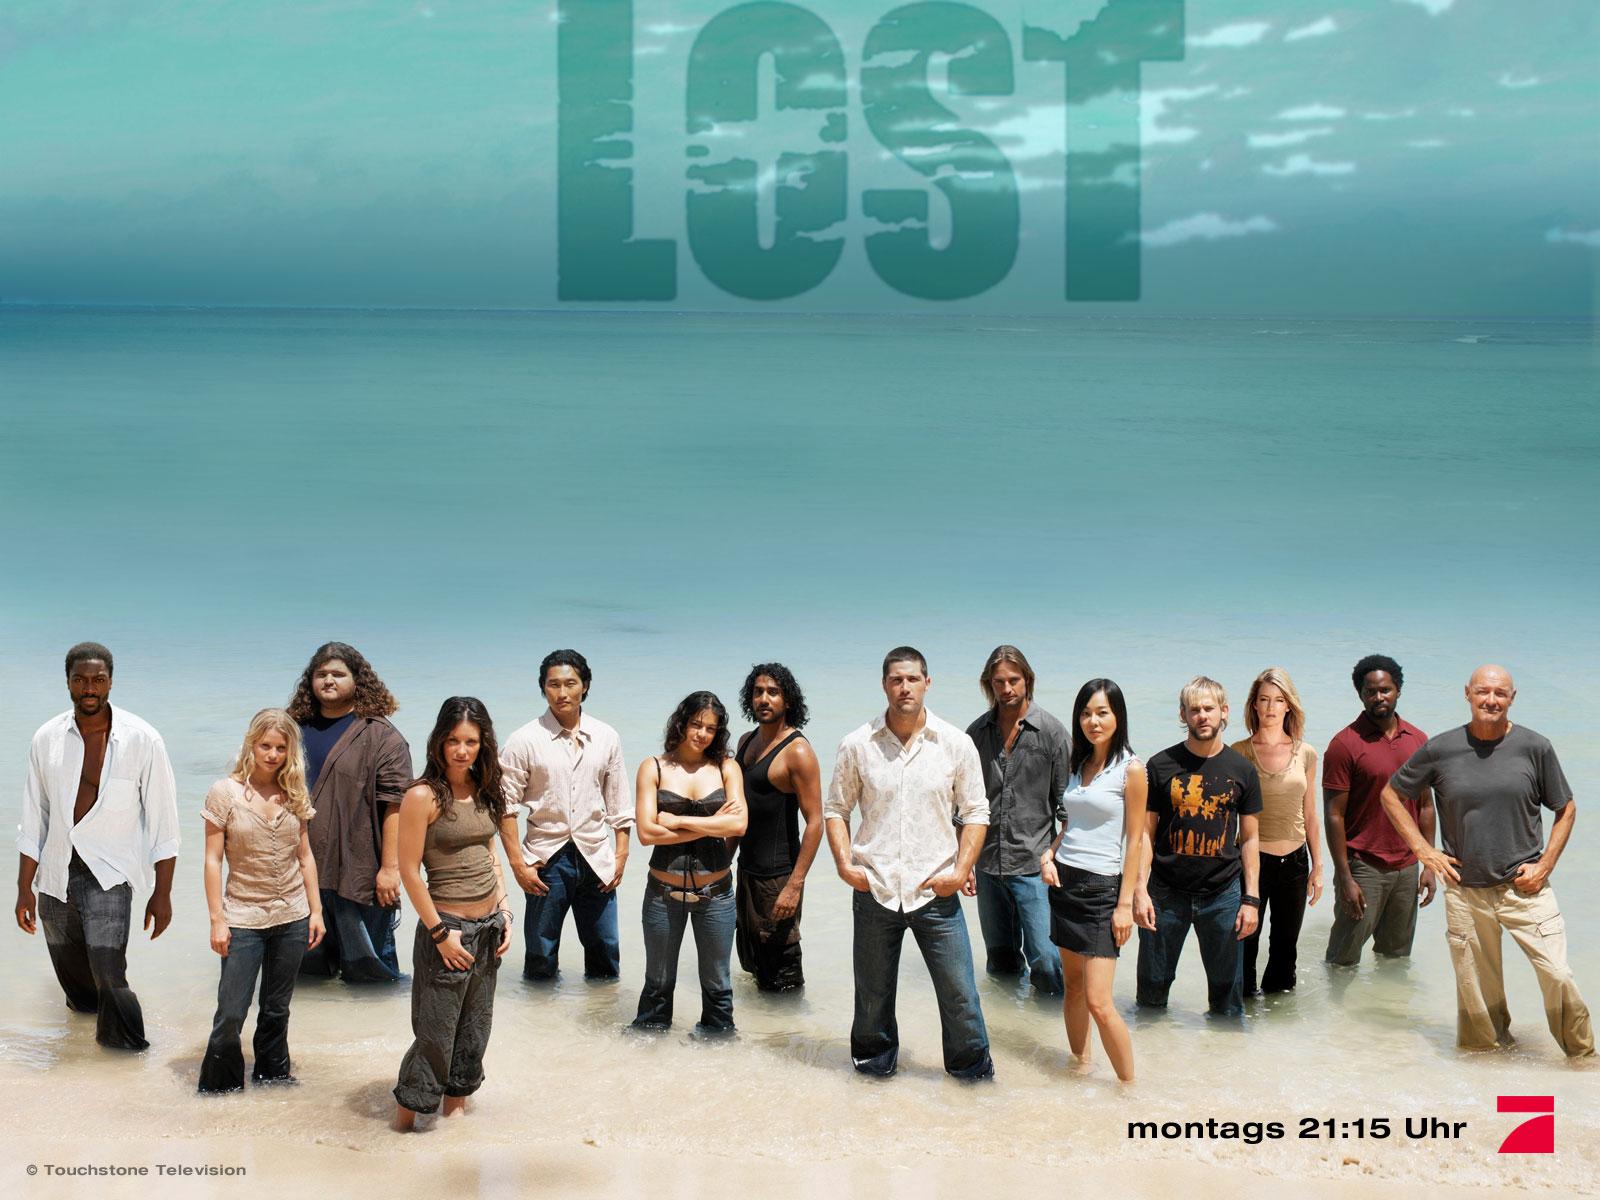 Lost photo